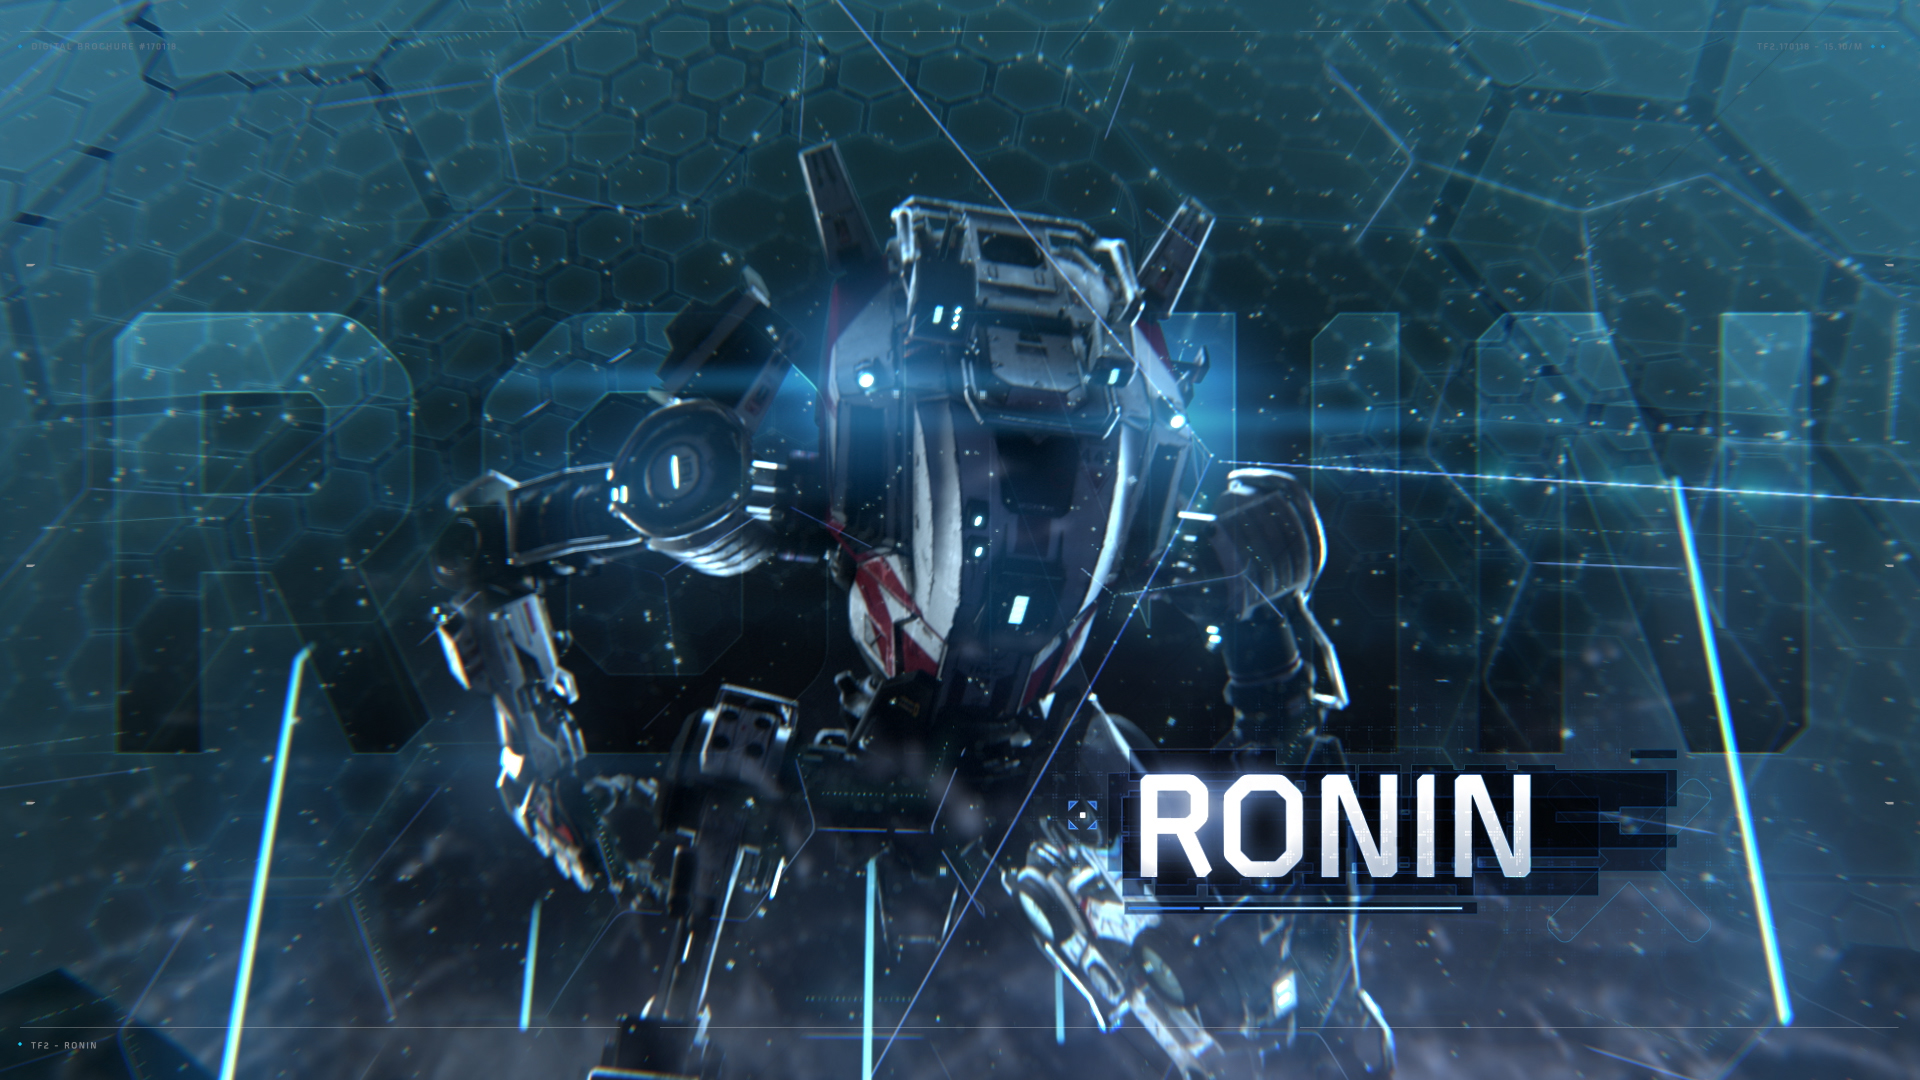 RONIN_01.jpg